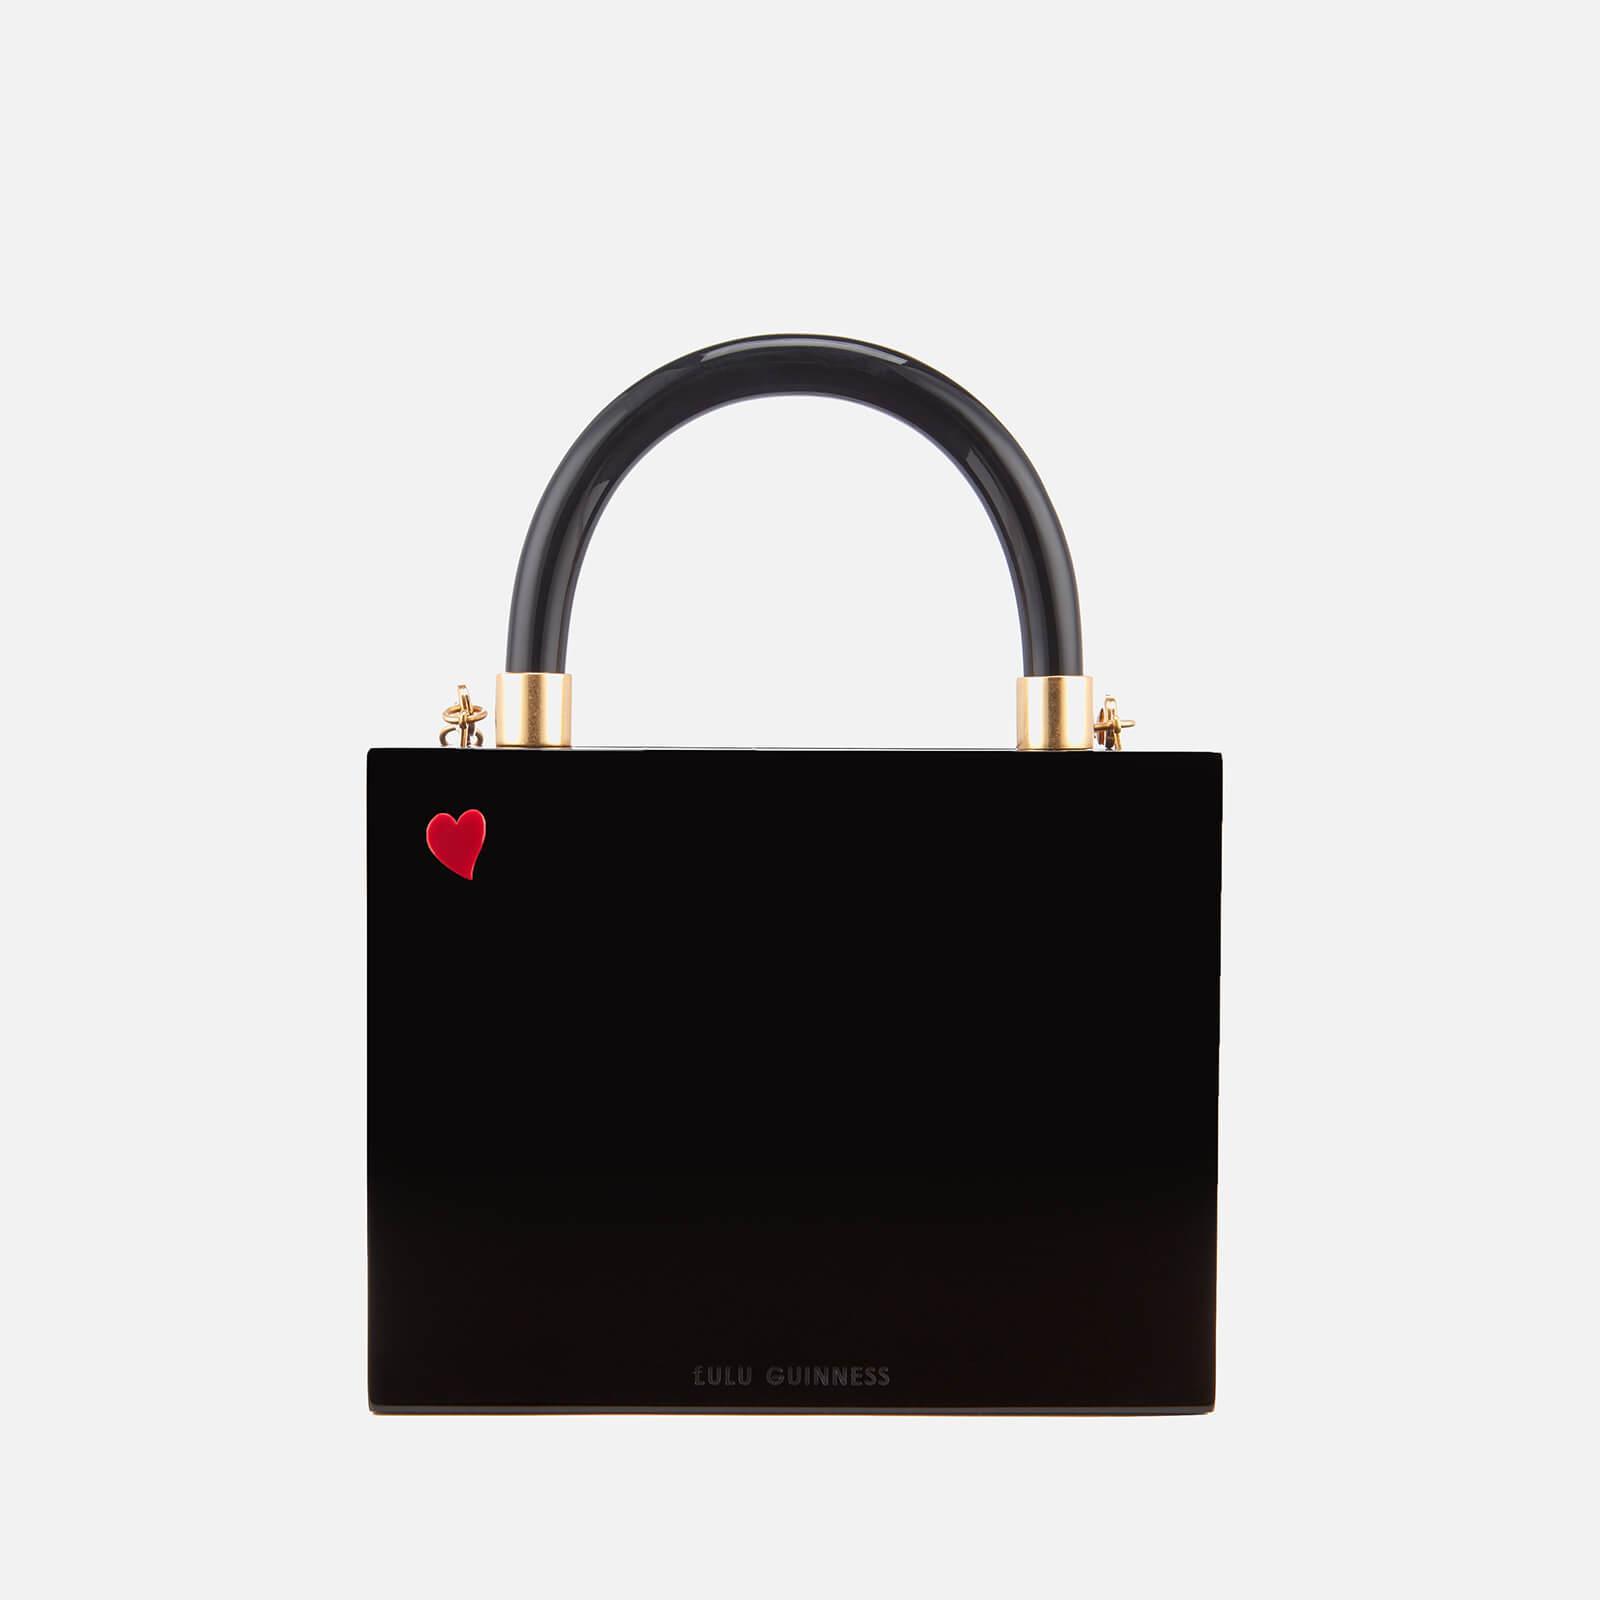 adcb8e58ee12d Lyst - Lulu Guinness Chloe Kissing Cameo Top Handle Bag in Black